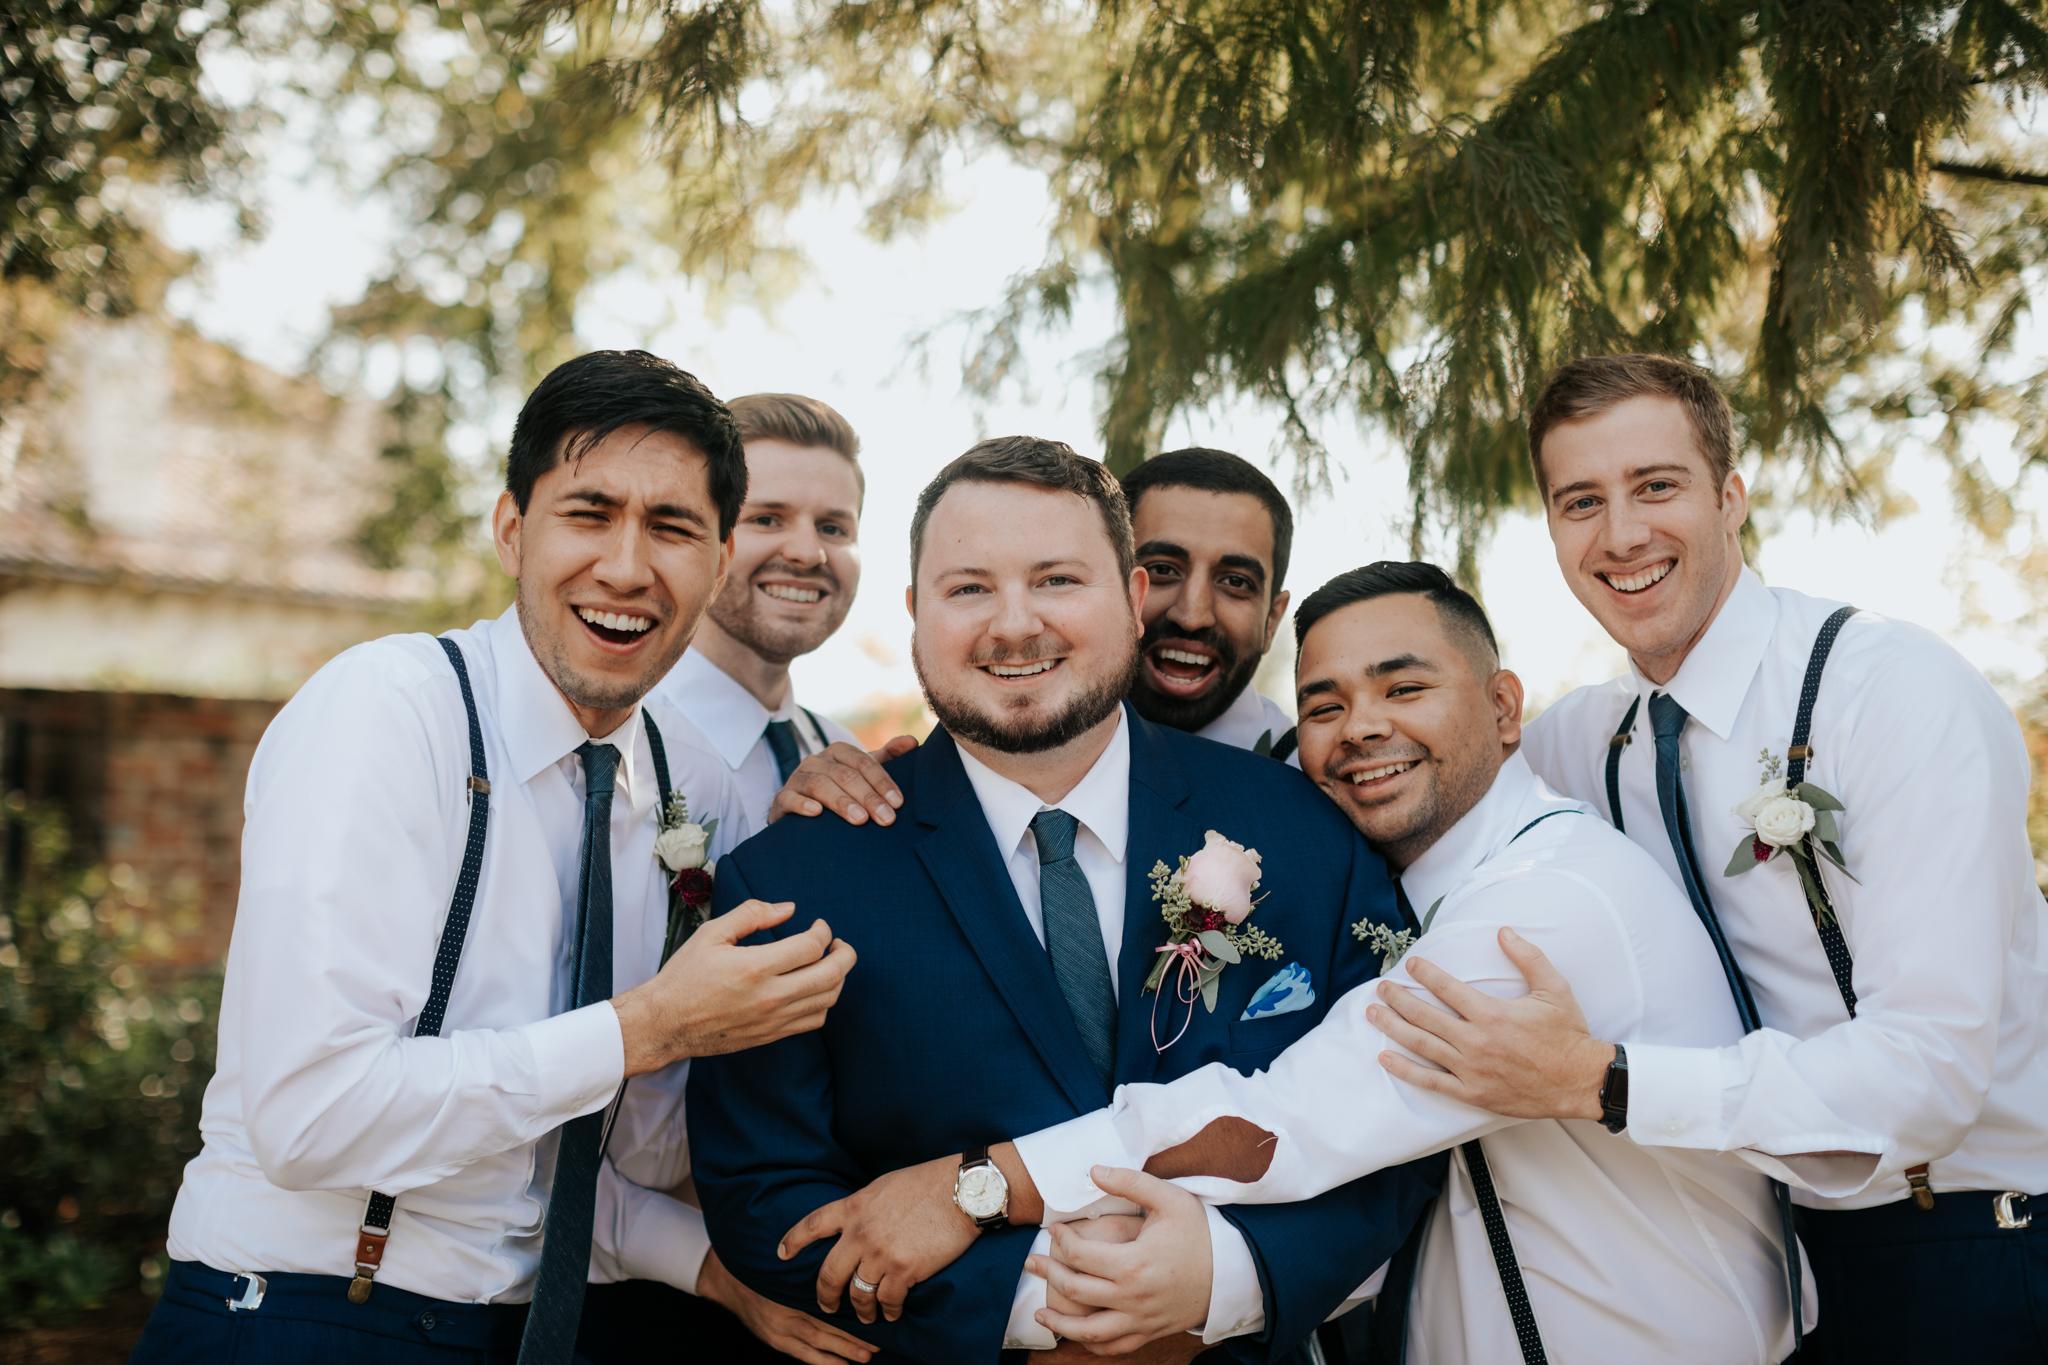 Leah Nicole Photography - Houston Wedding Photographer-Lake Conroe Wedding- Houston Wedding Photographer-17.jpg